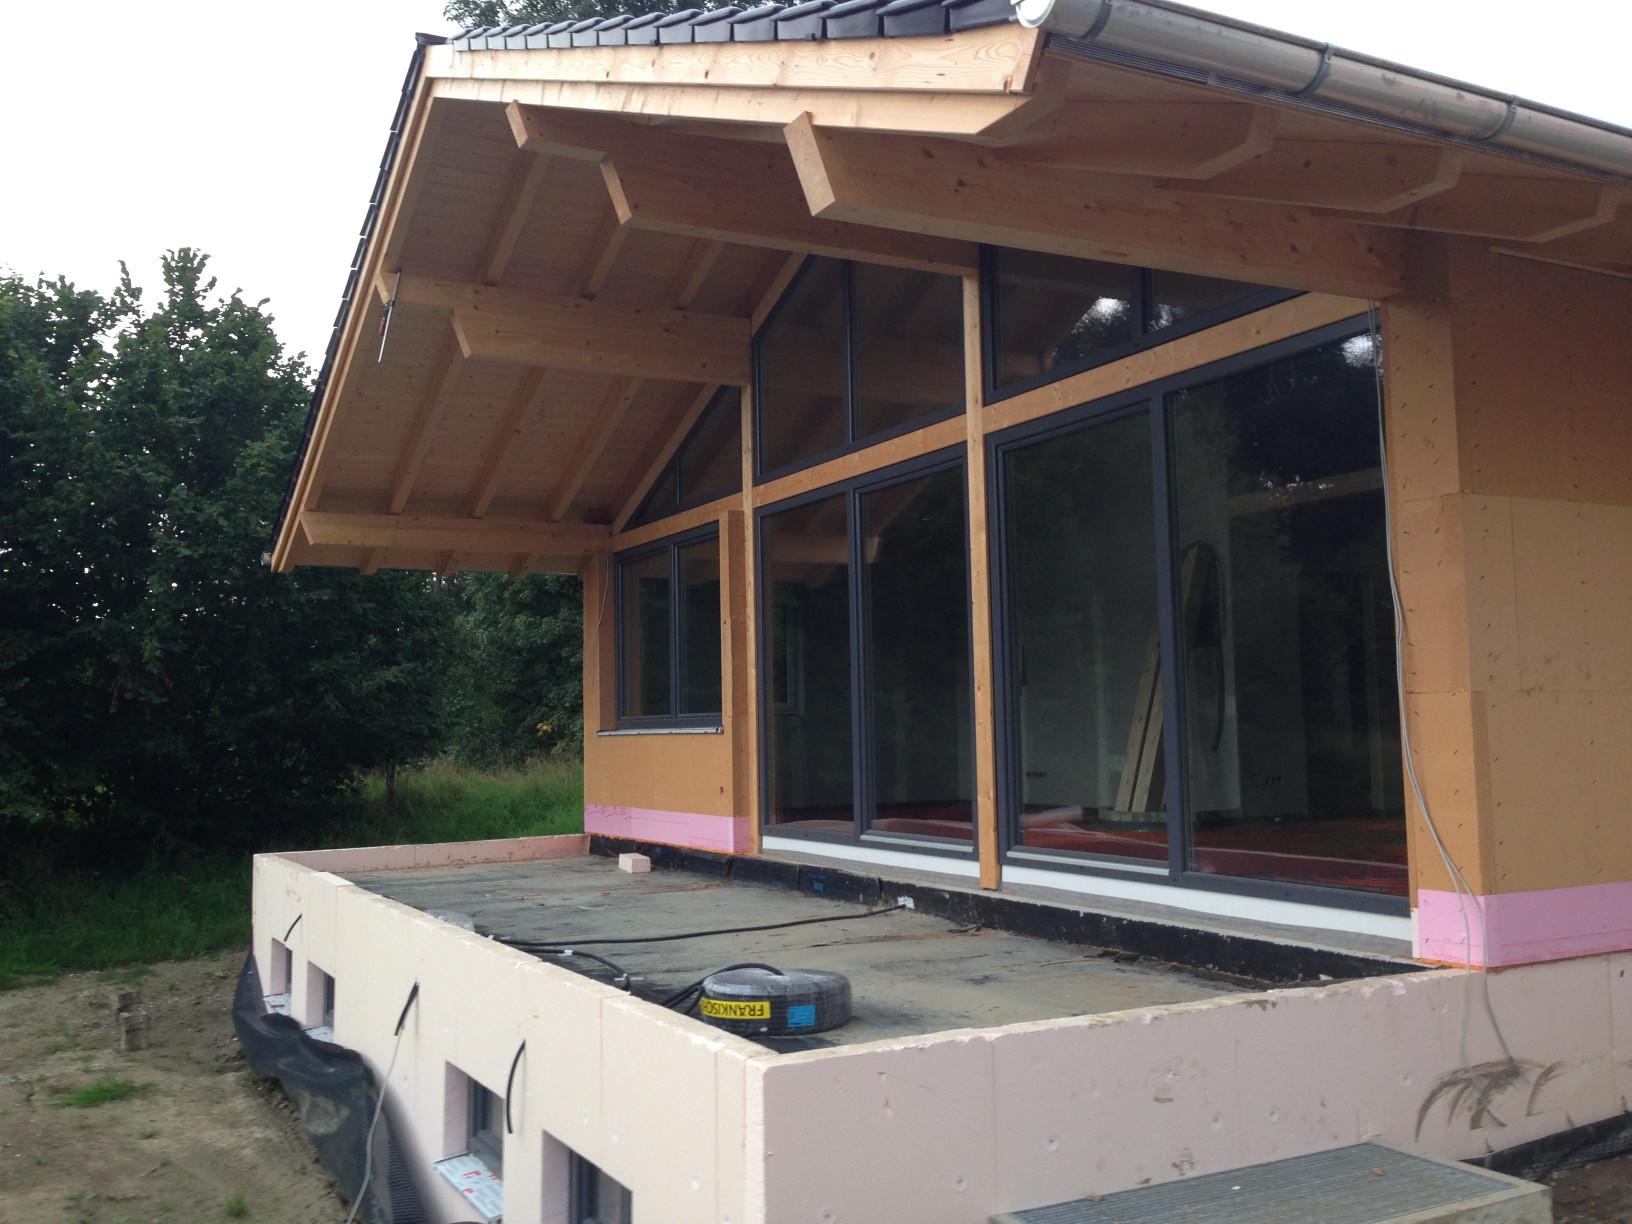 IMG_3200Strasser Holzbau Riedering.jpg